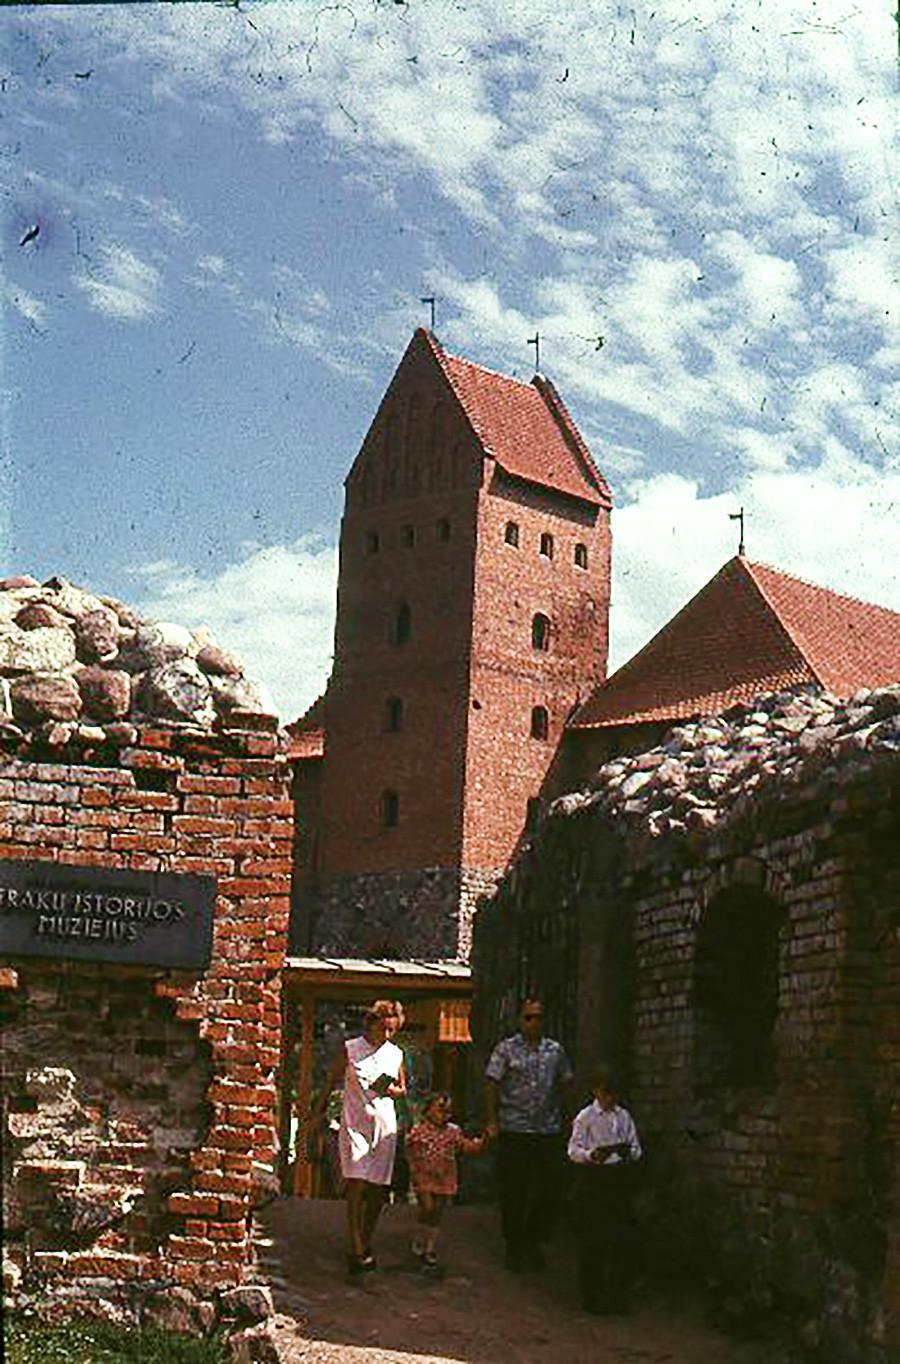 Castelo da ilha de Trakai, década de 1960